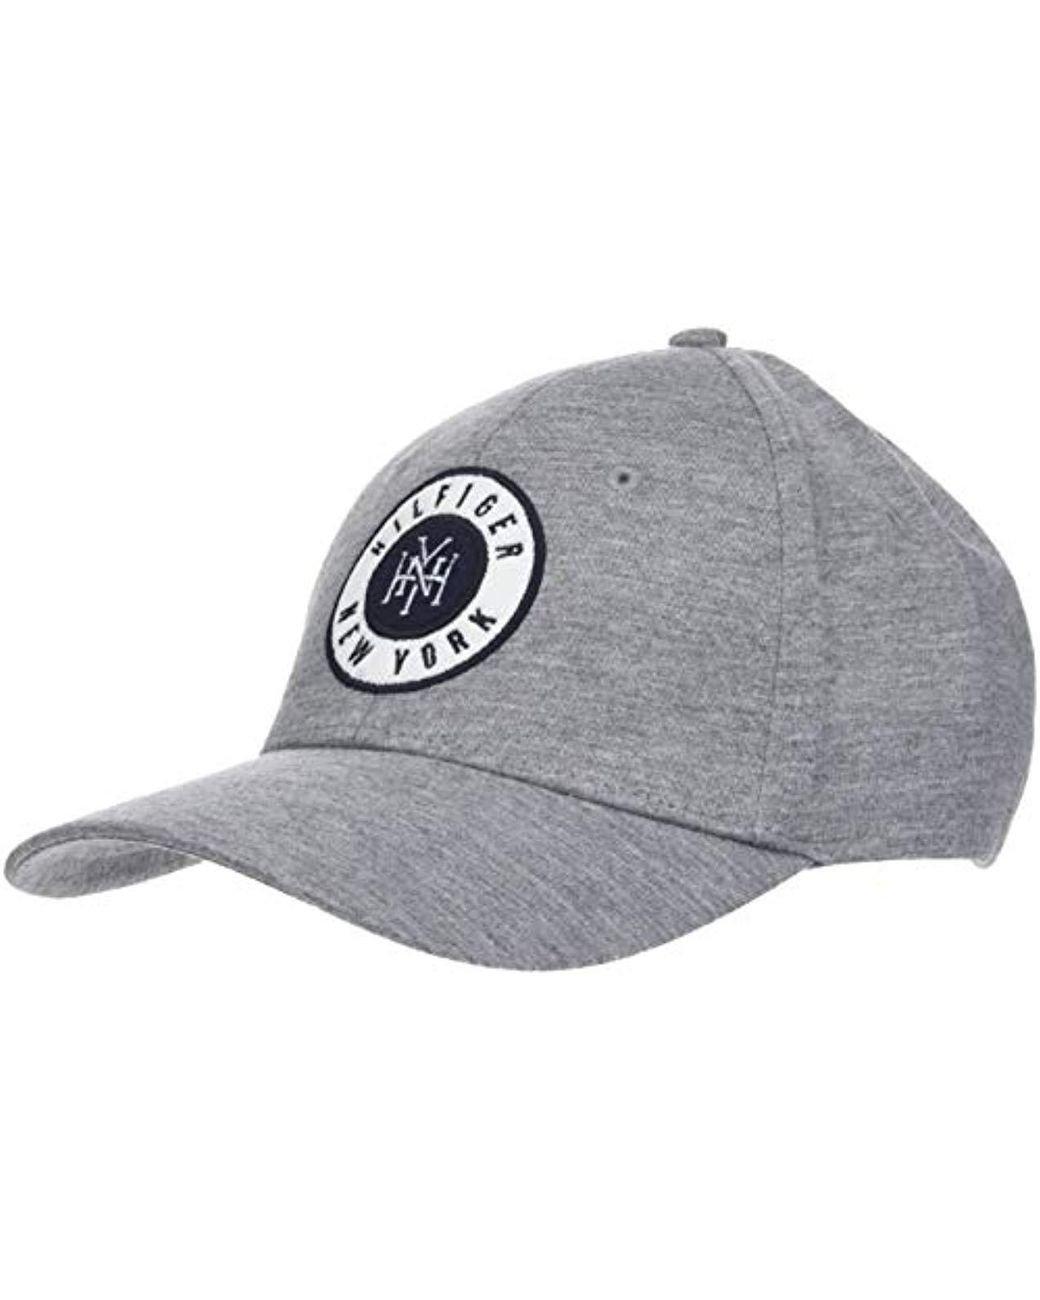 33c0c8cc848 Tommy Hilfiger Badge Cap Baseball